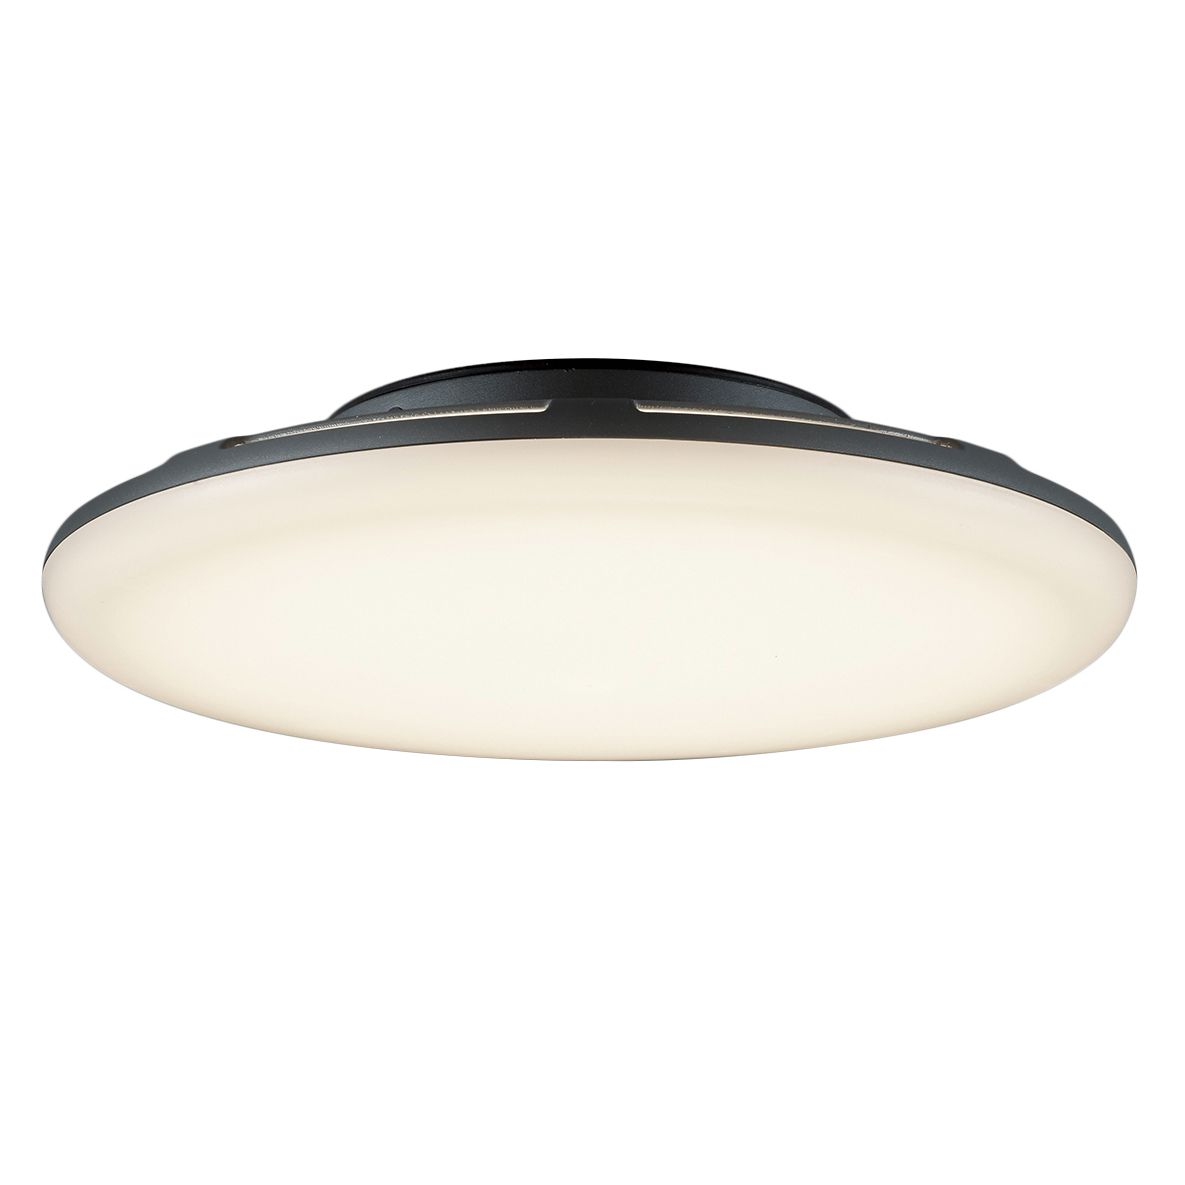 EEK A+, LED-Außenleuchte Bering - Aluminium / Kunststoff - 1-flammig - 27 - Anthrazit, Trio